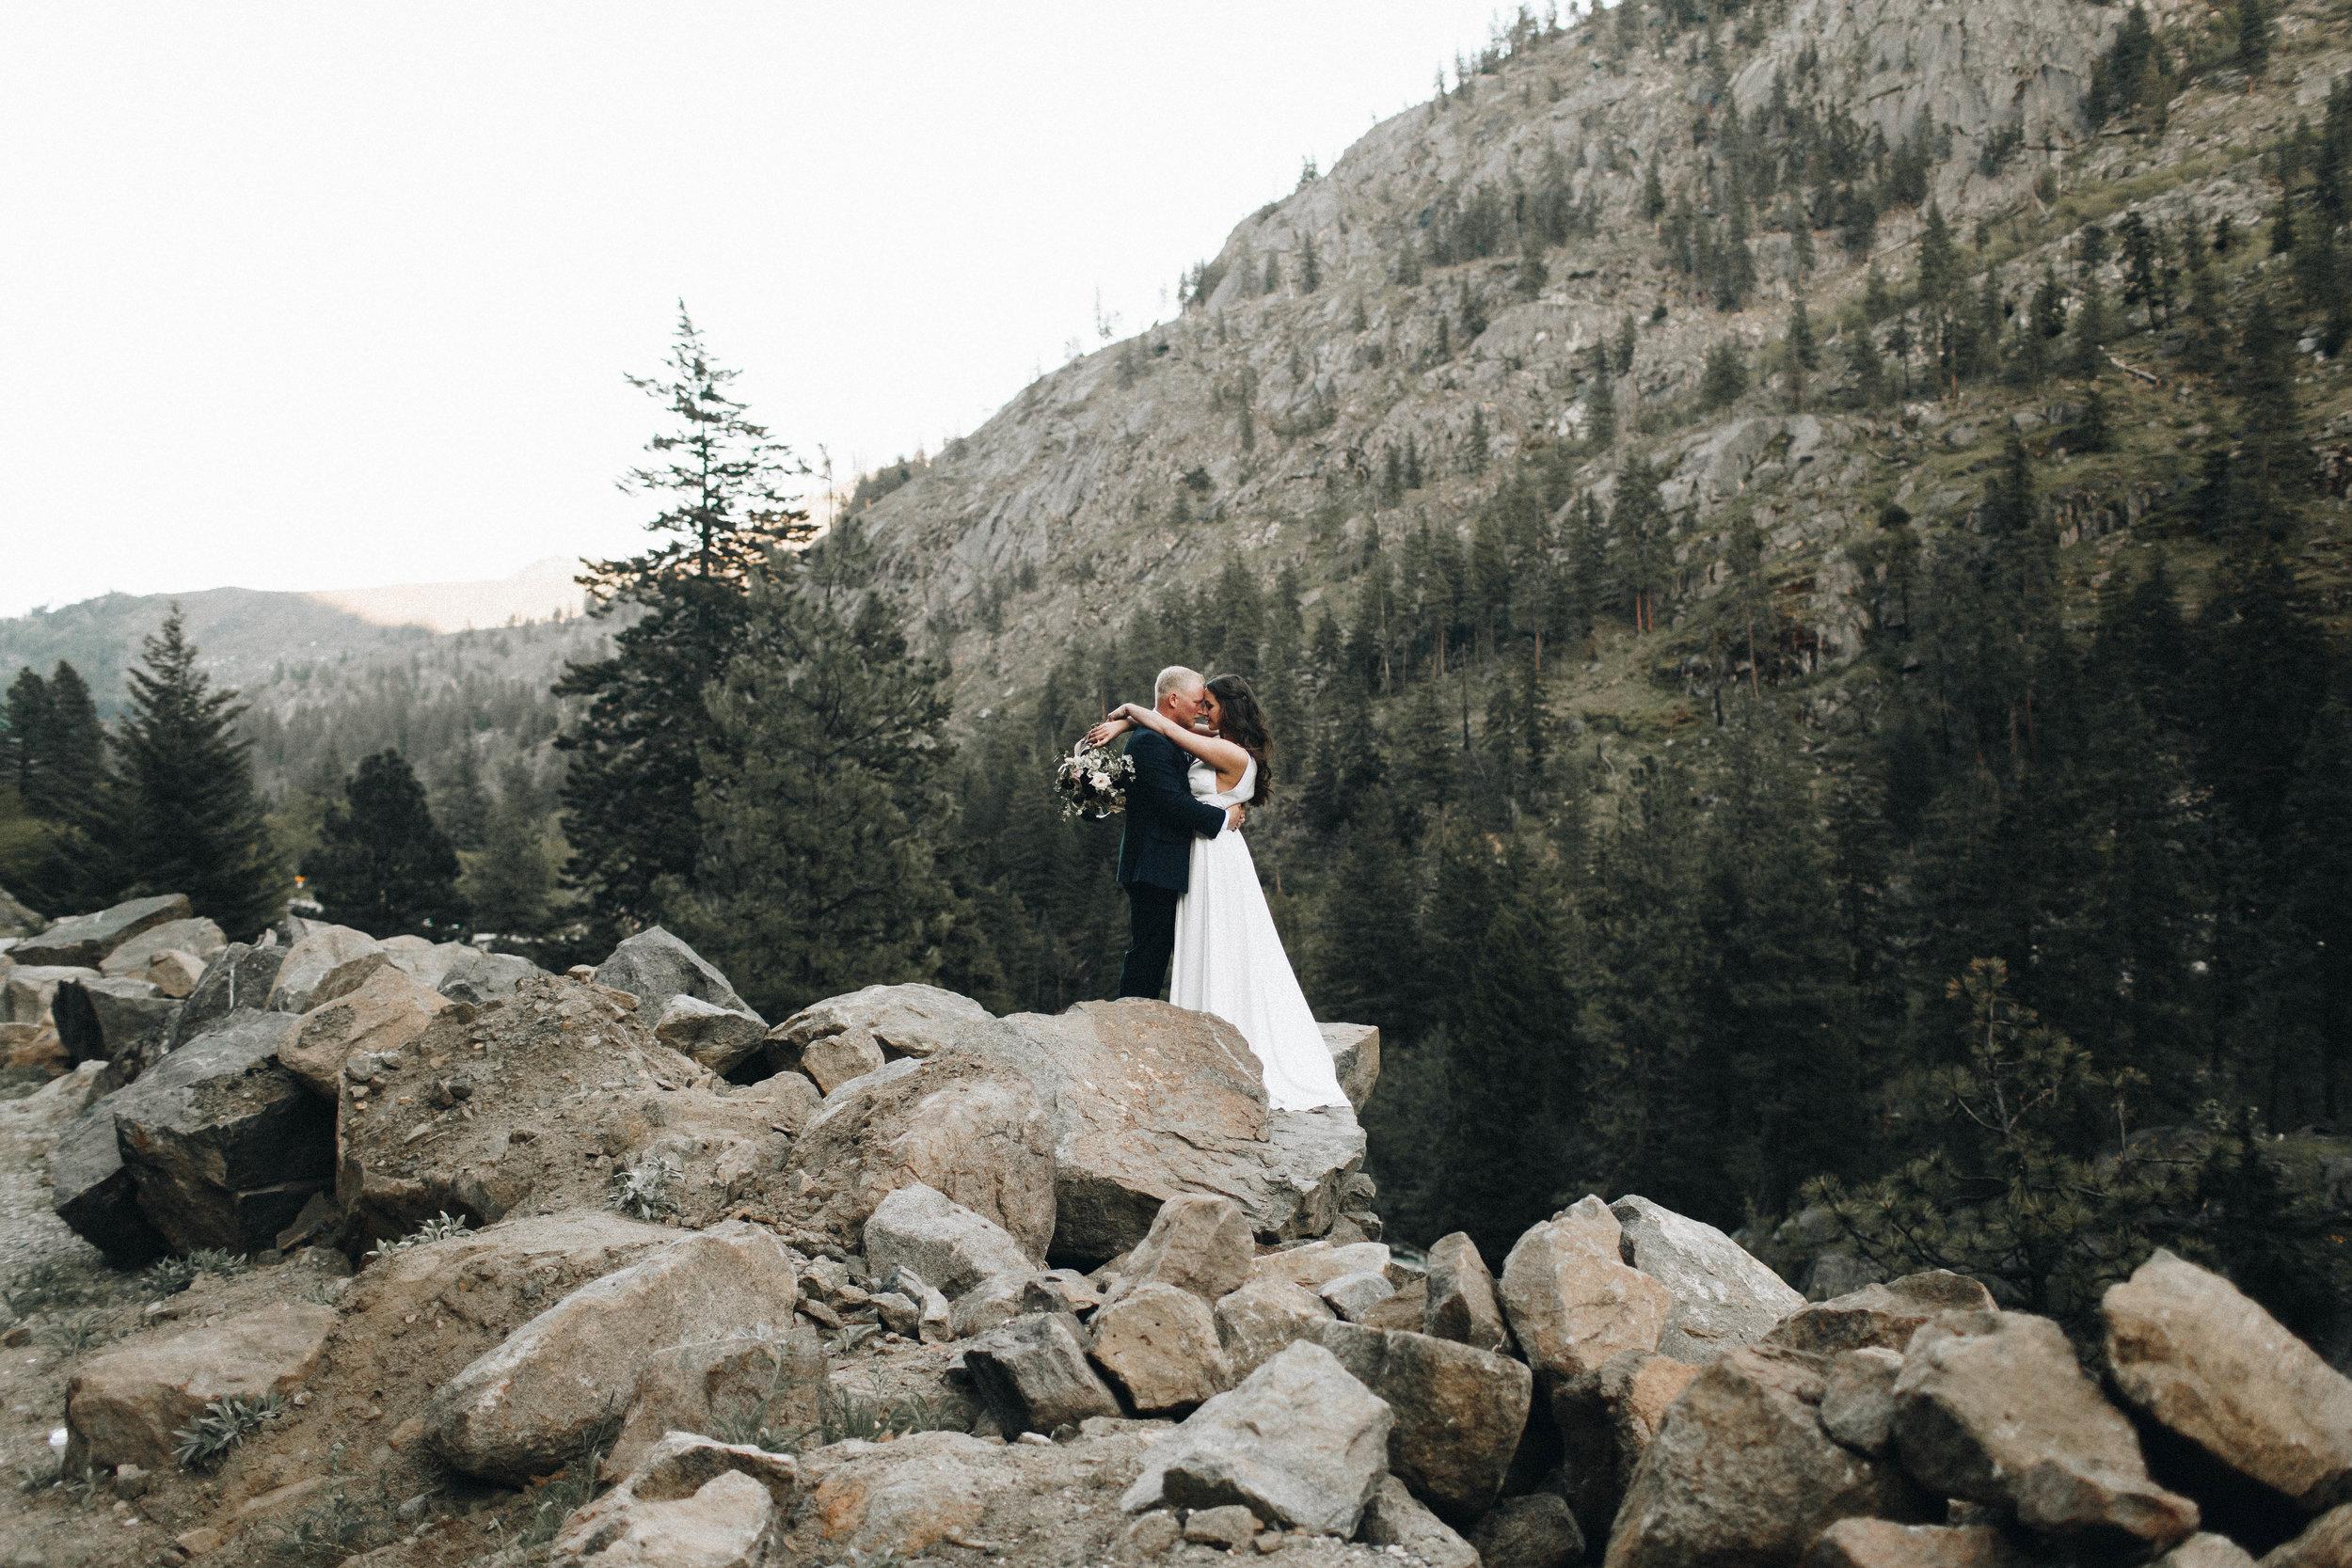 weddings - VIEW MORE.